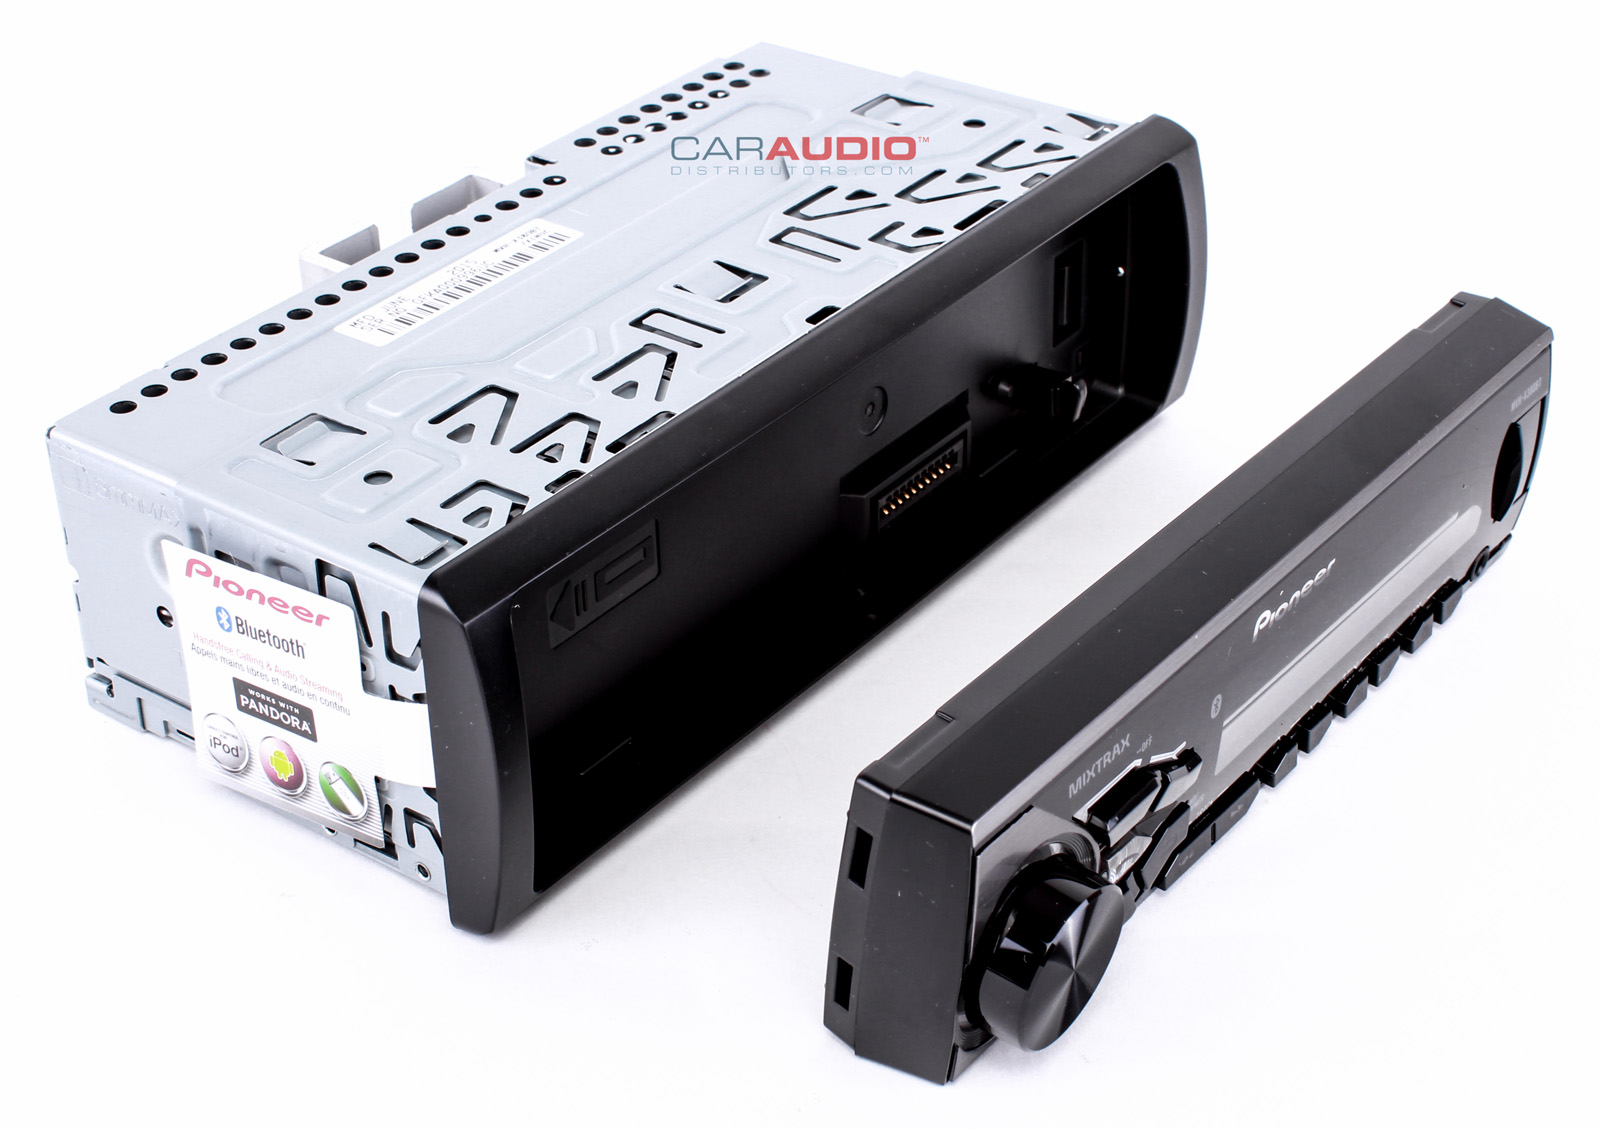 Car Stereo Bluetooth: PIONEER MVH-X380BT SINGLE DIN DIGITAL MEDIA MP3 BLUETOOTH